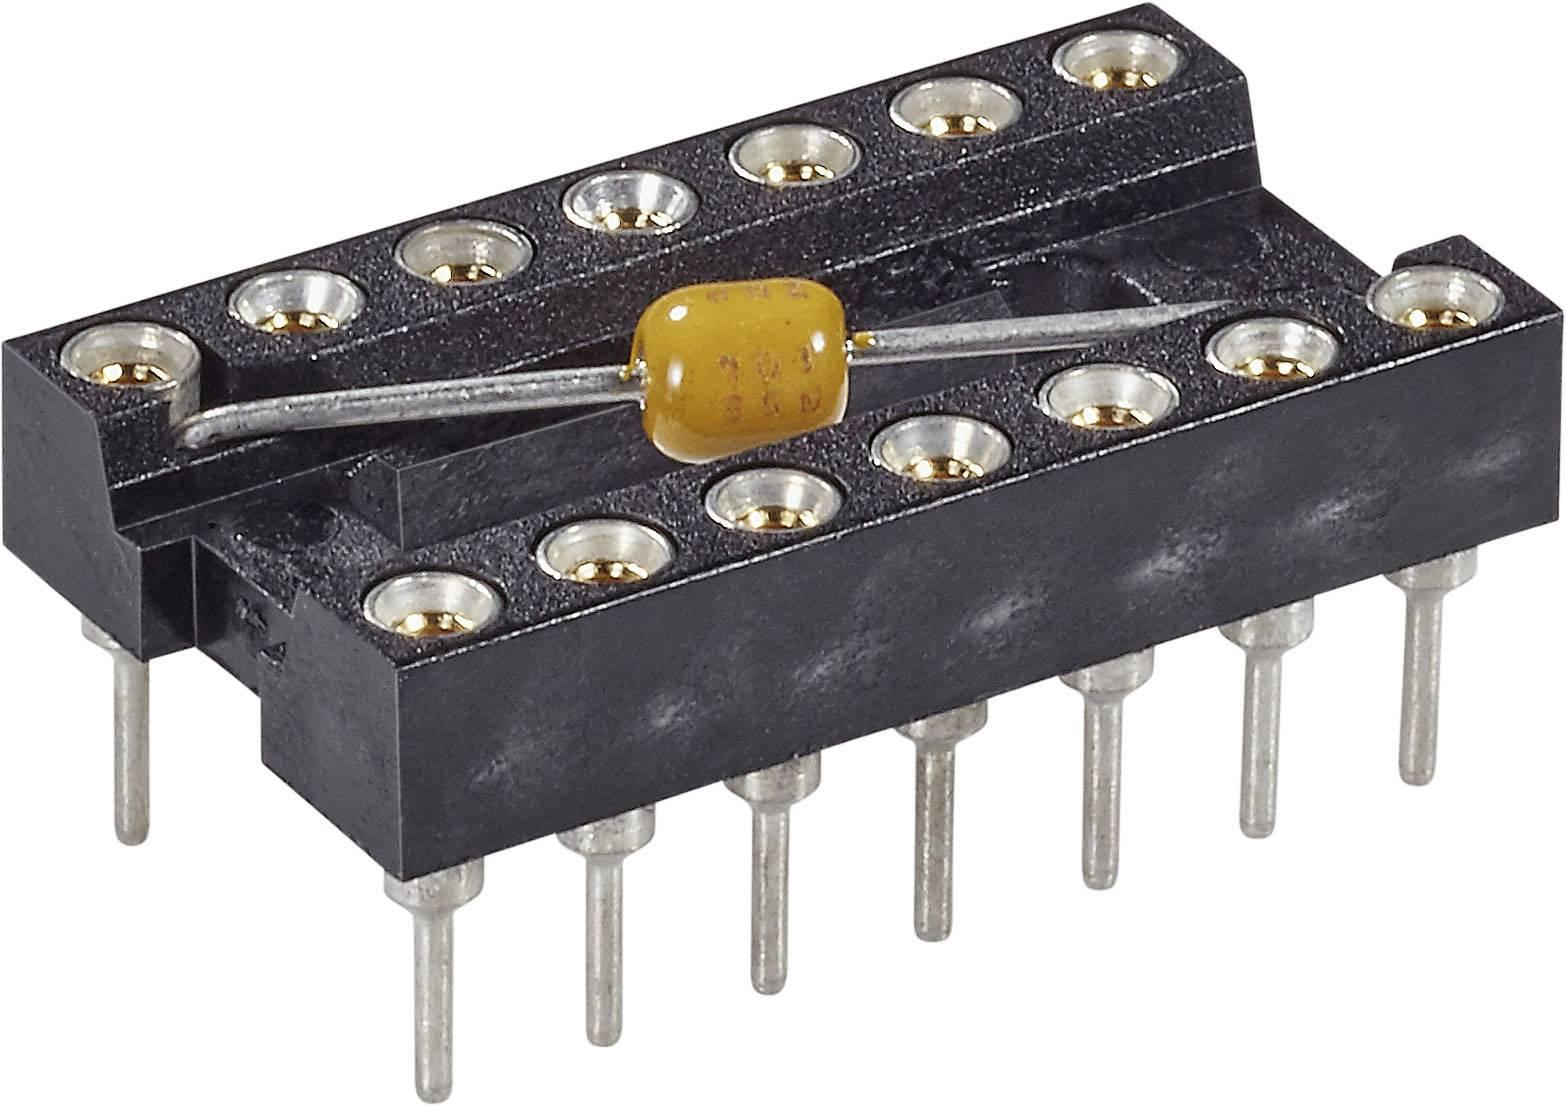 IC pätica MPE Garry 001-3-014-3-B1STF-XT0 presné kontakty, s kondenzátorom, rozteč 7.62 mm, pólů 14, 1 ks